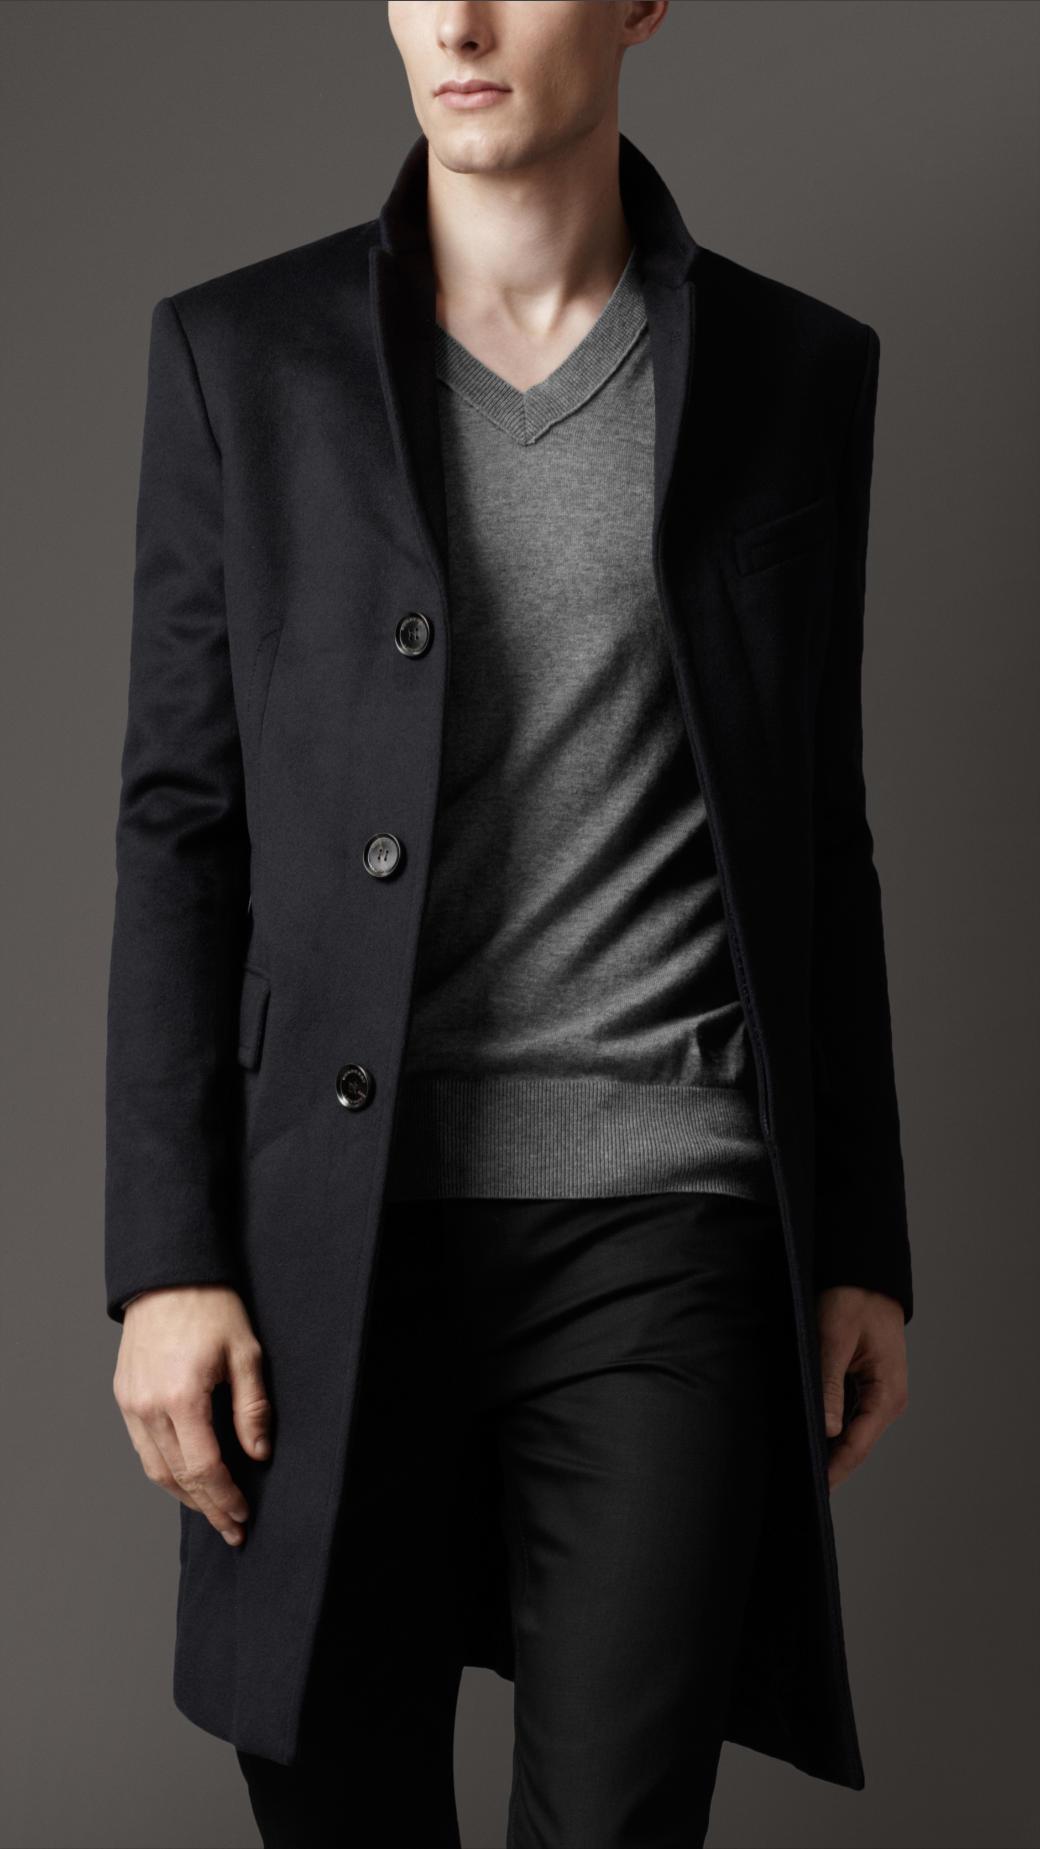 Mens Long Wool Overcoats Uk - All The Best Coat In 2017